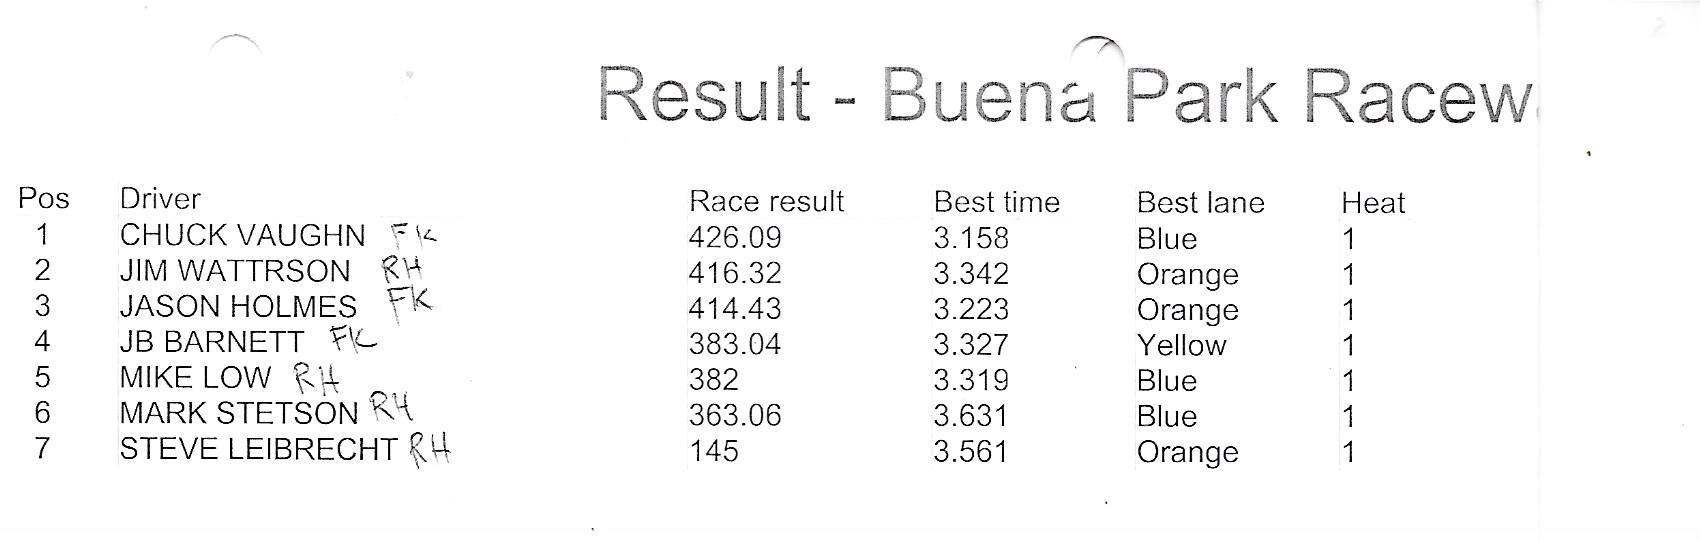 9317 hw results.jpeg.jpeg